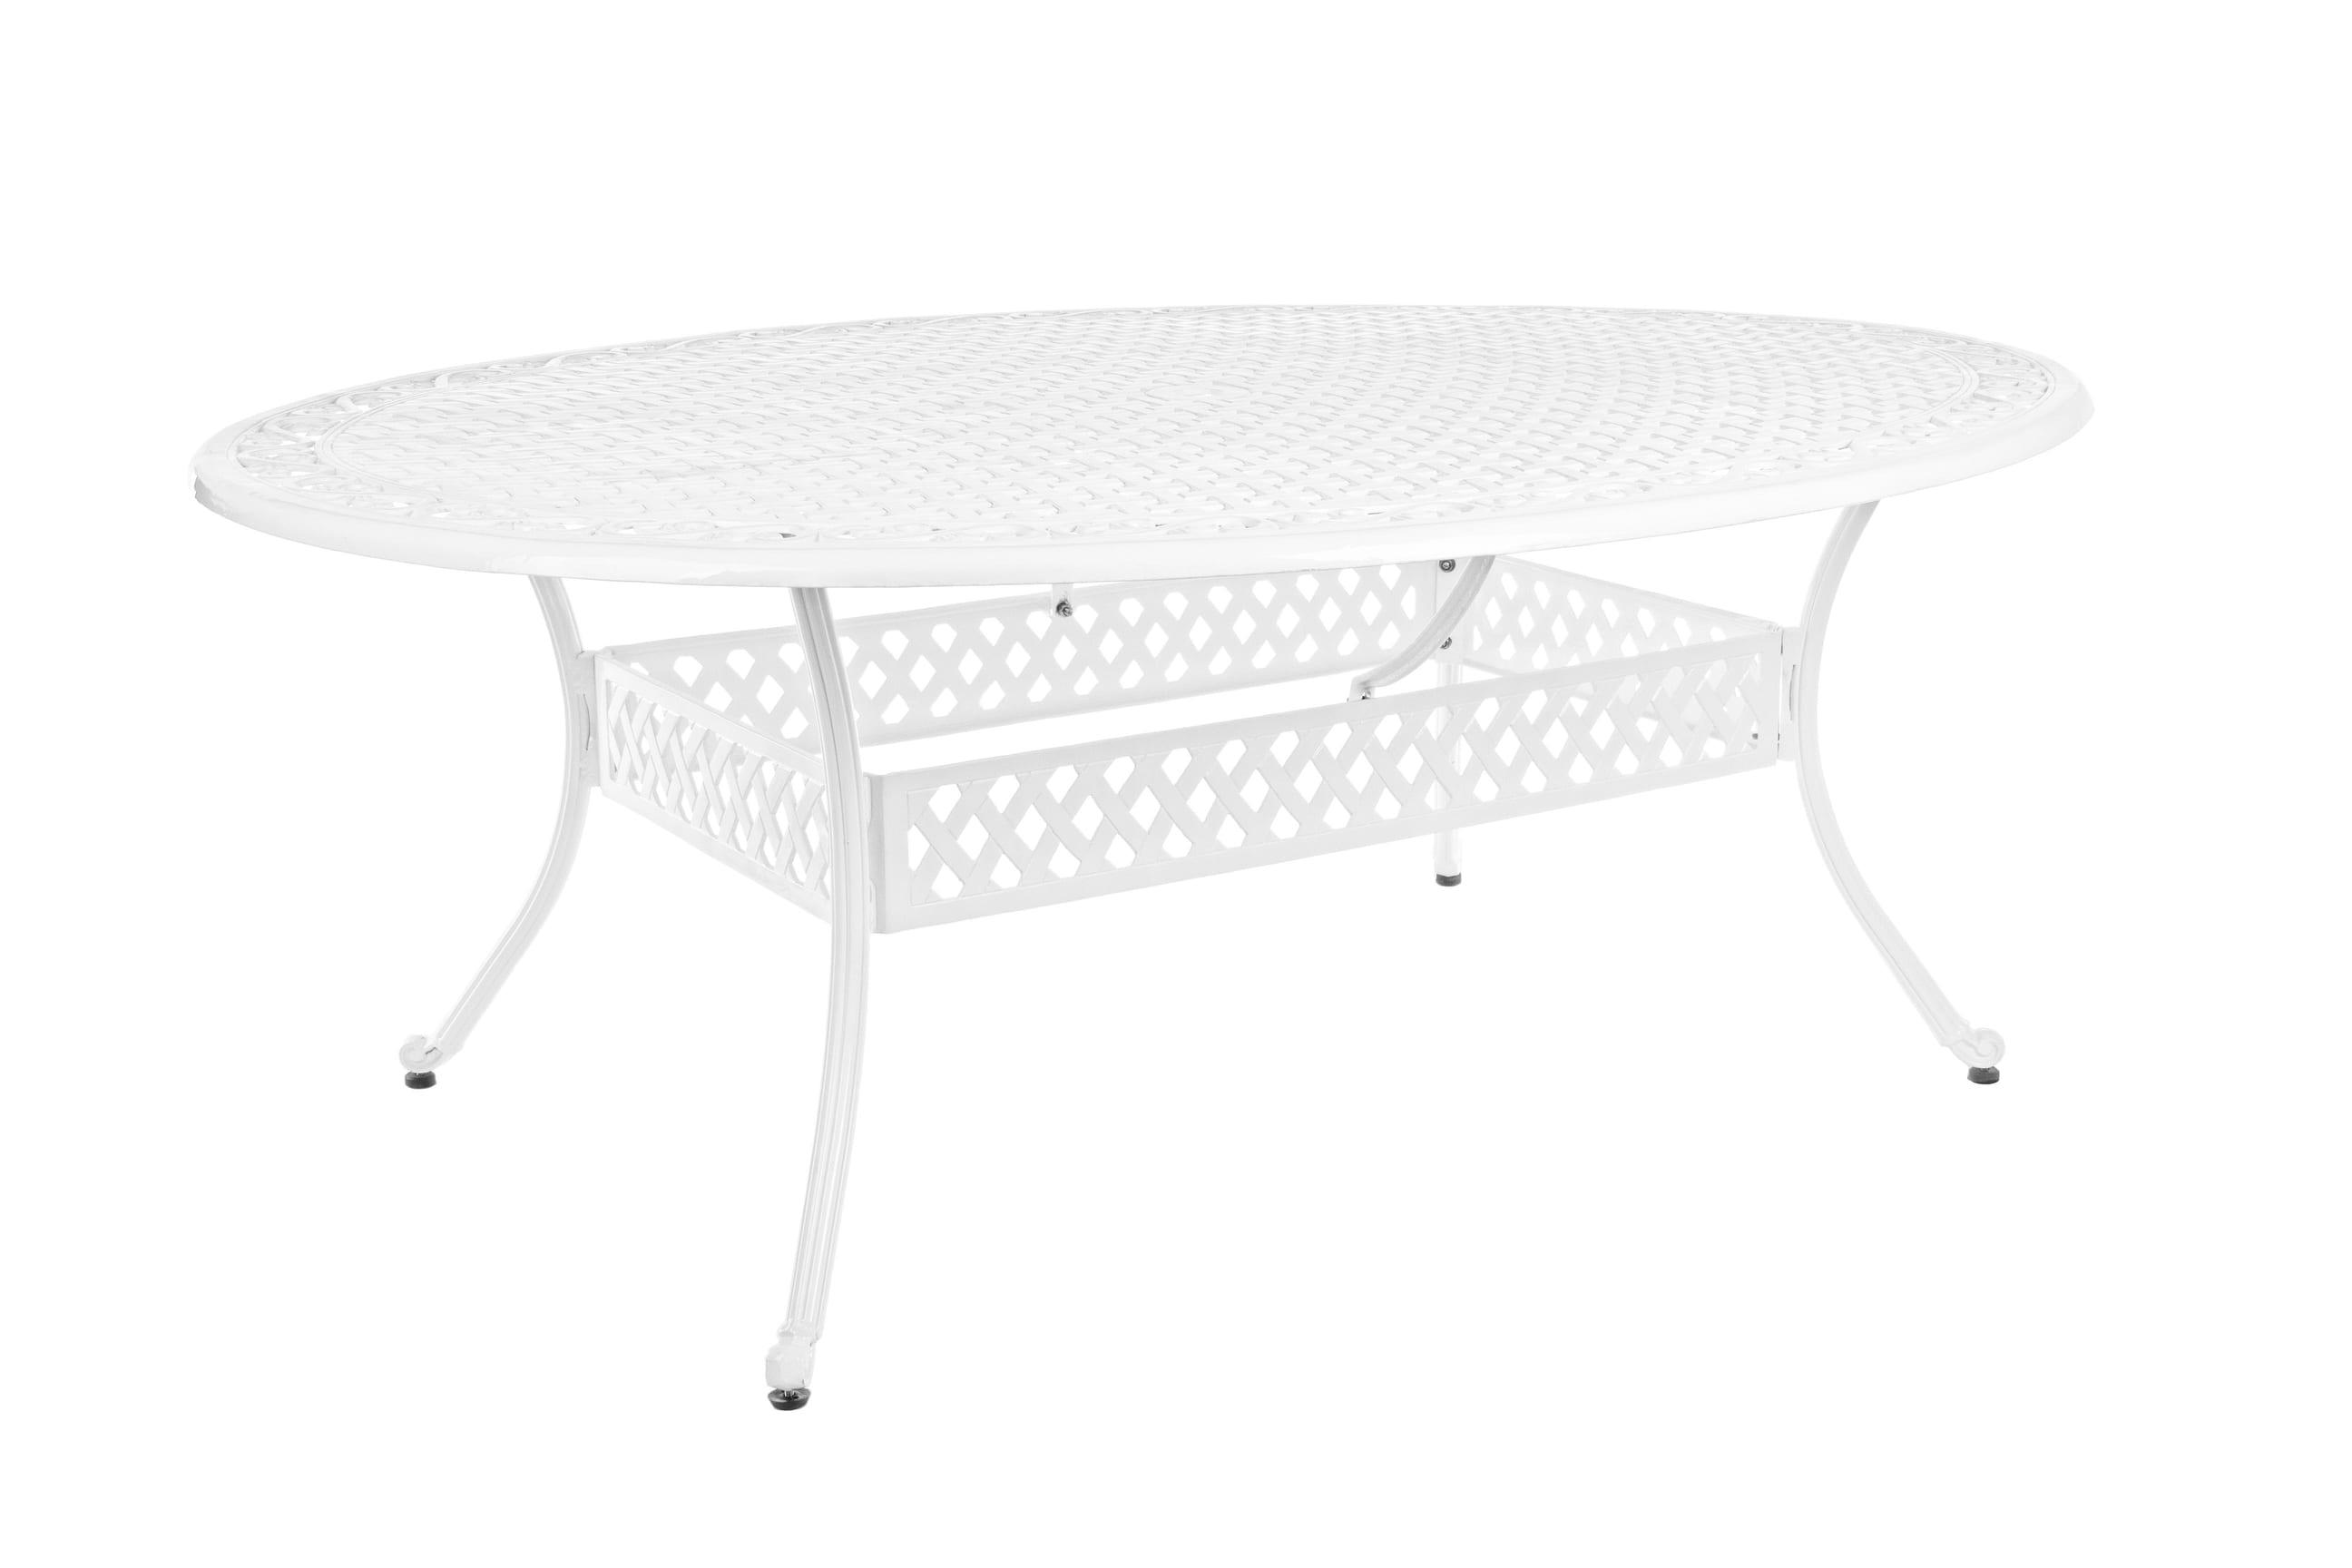 Tavoli Da Giardino In Resina Grand Soleil.Tavoli E Tavolini Tavoli Standard Verde Tavoli E Tavolini Casa E